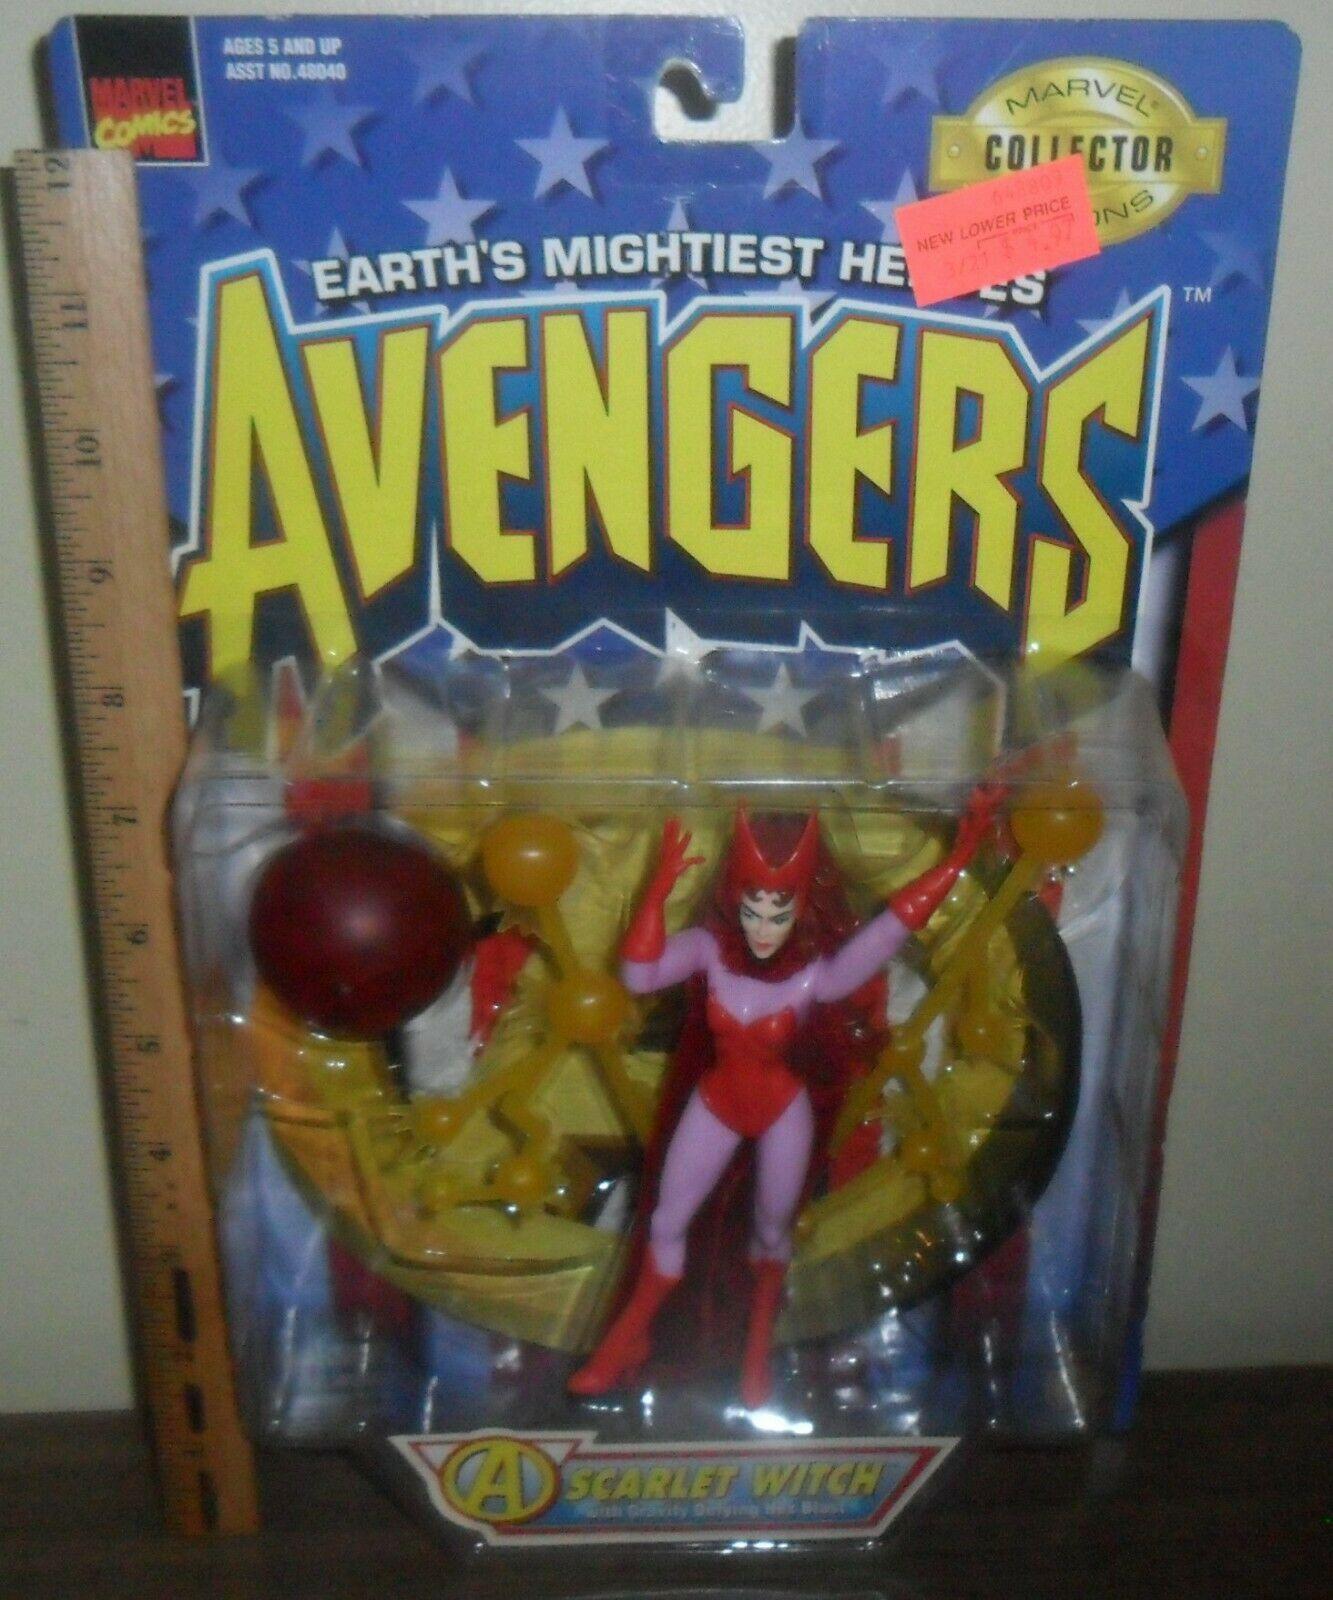 1997 Toy Biz Marvel Comics Avengers Action Figure ~ Scarlet Witch